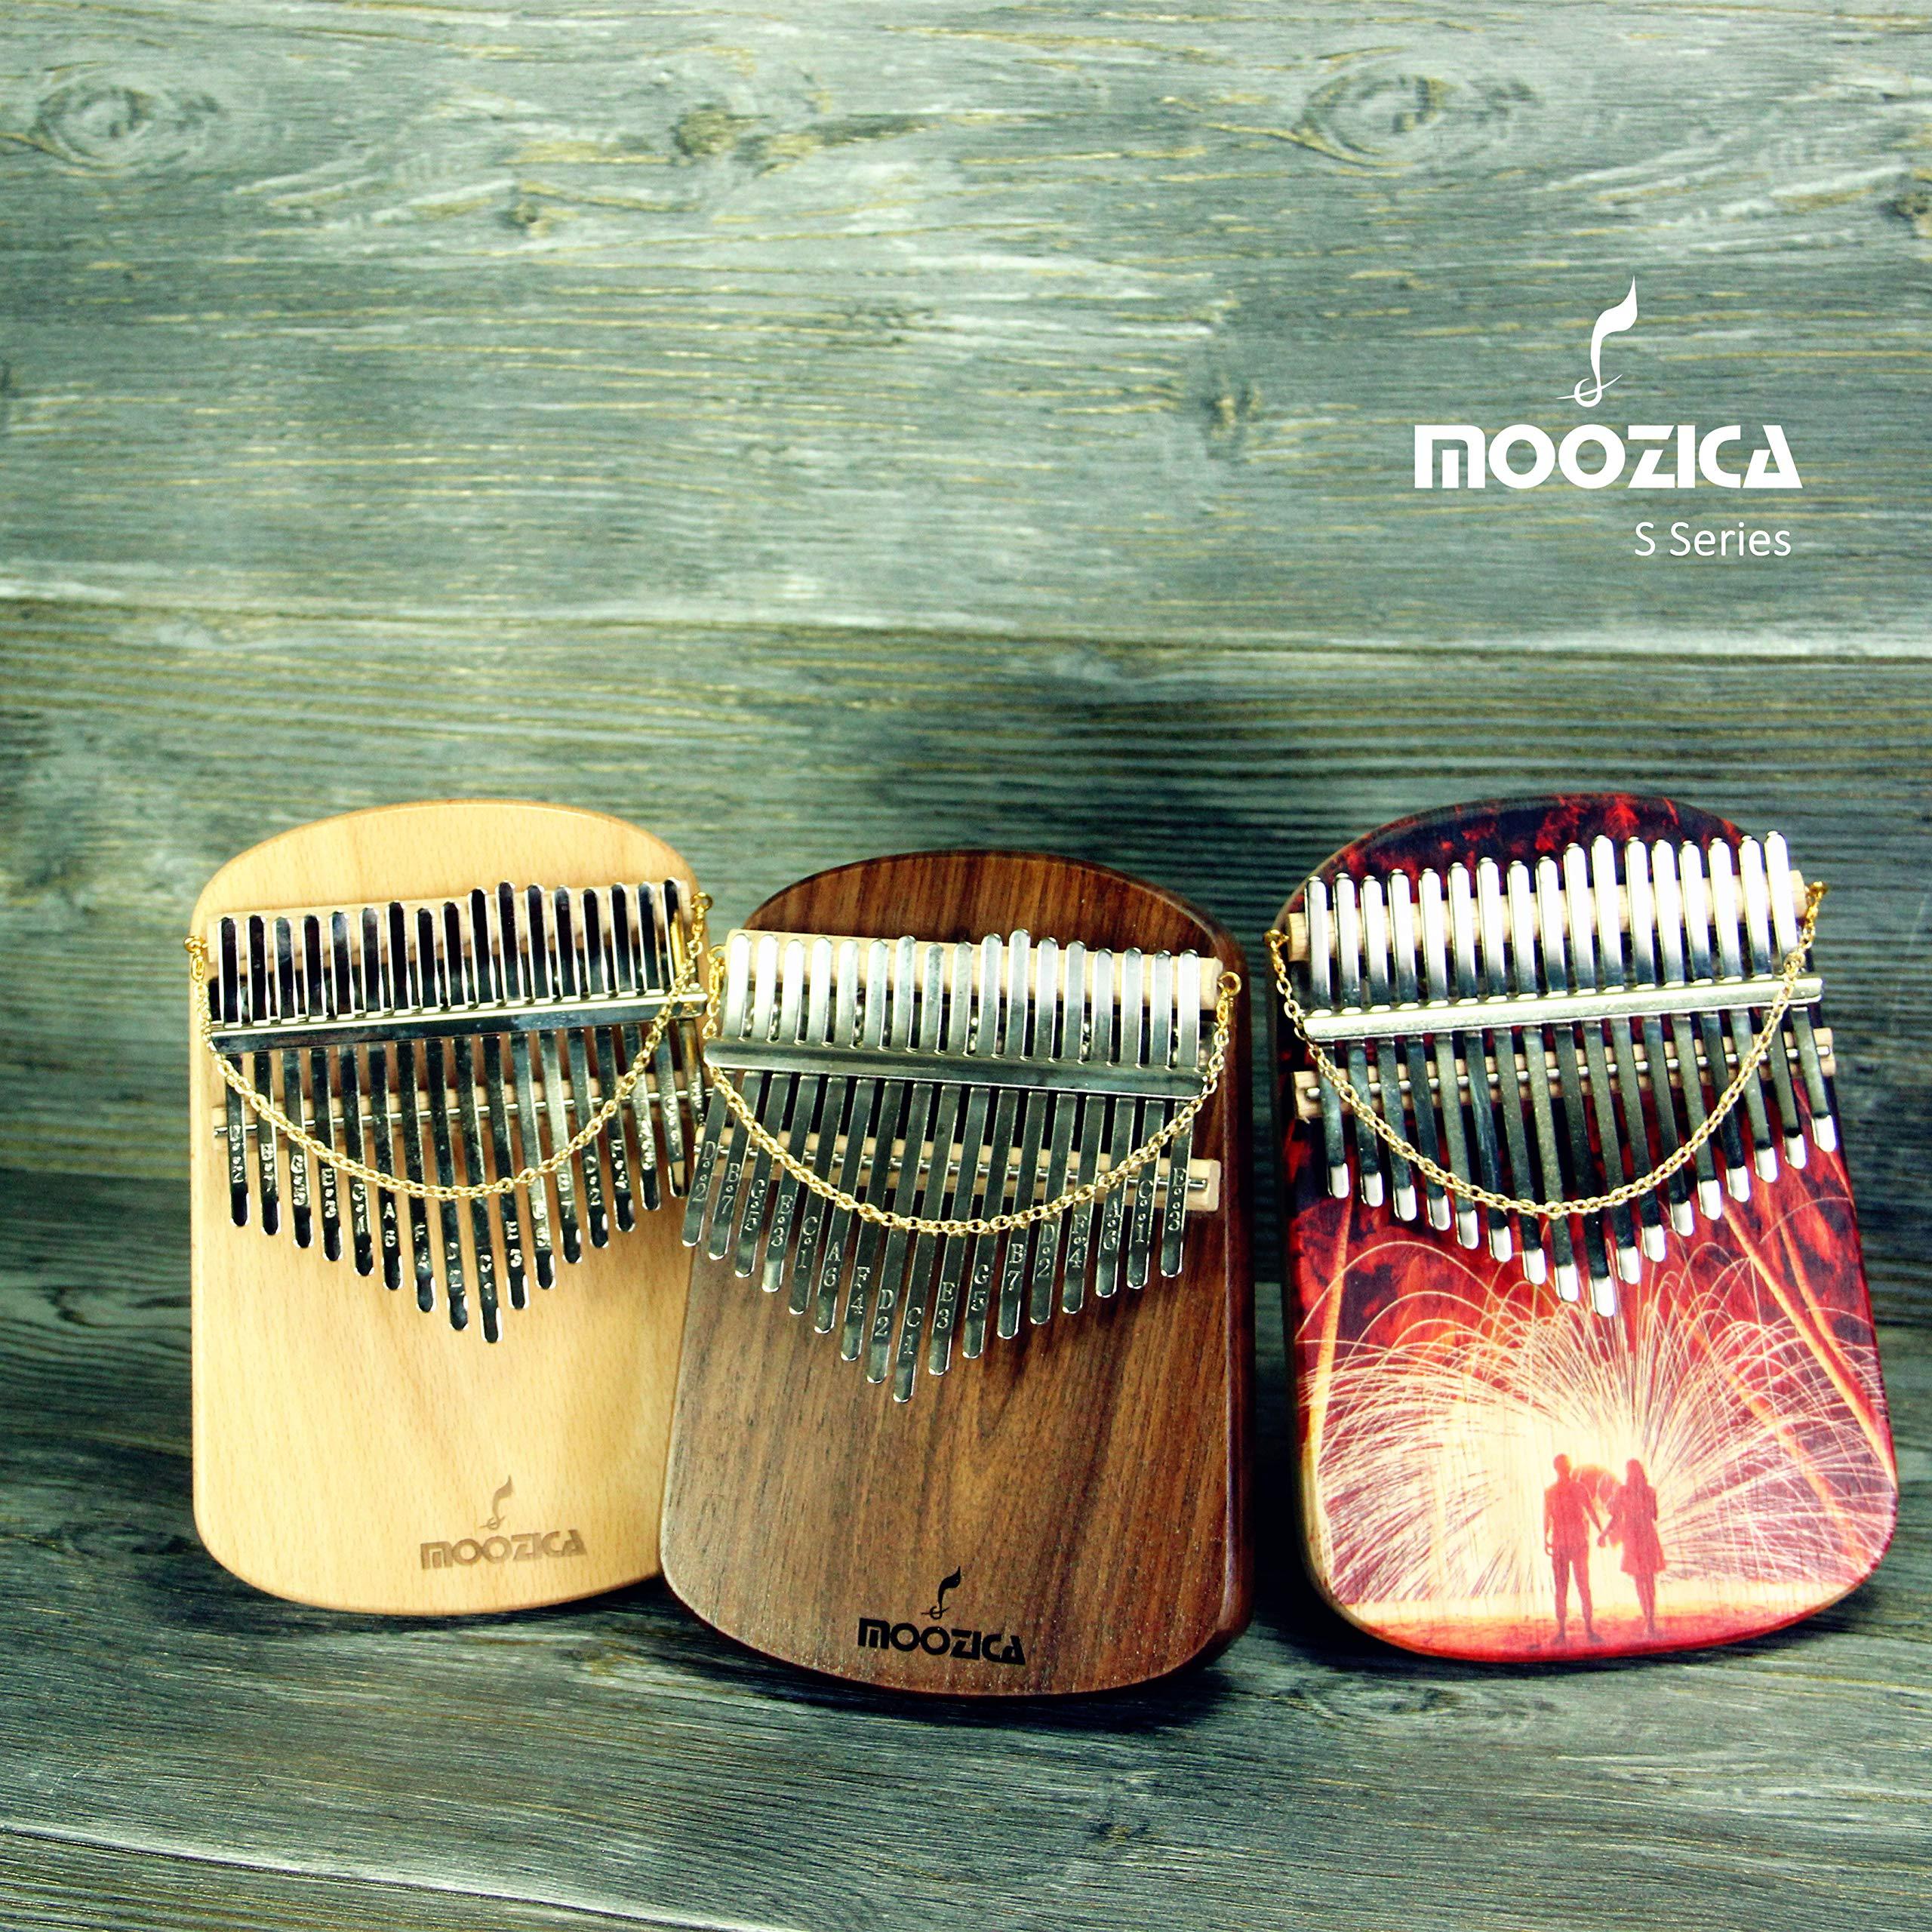 Moozica Kalimba 17 Keys Solid Walnut Wood Kalimba, Solid Walnut Wood Single Board Thumb Piano Marimba with Learning Instruction(K17S-W) by Moozica (Image #7)